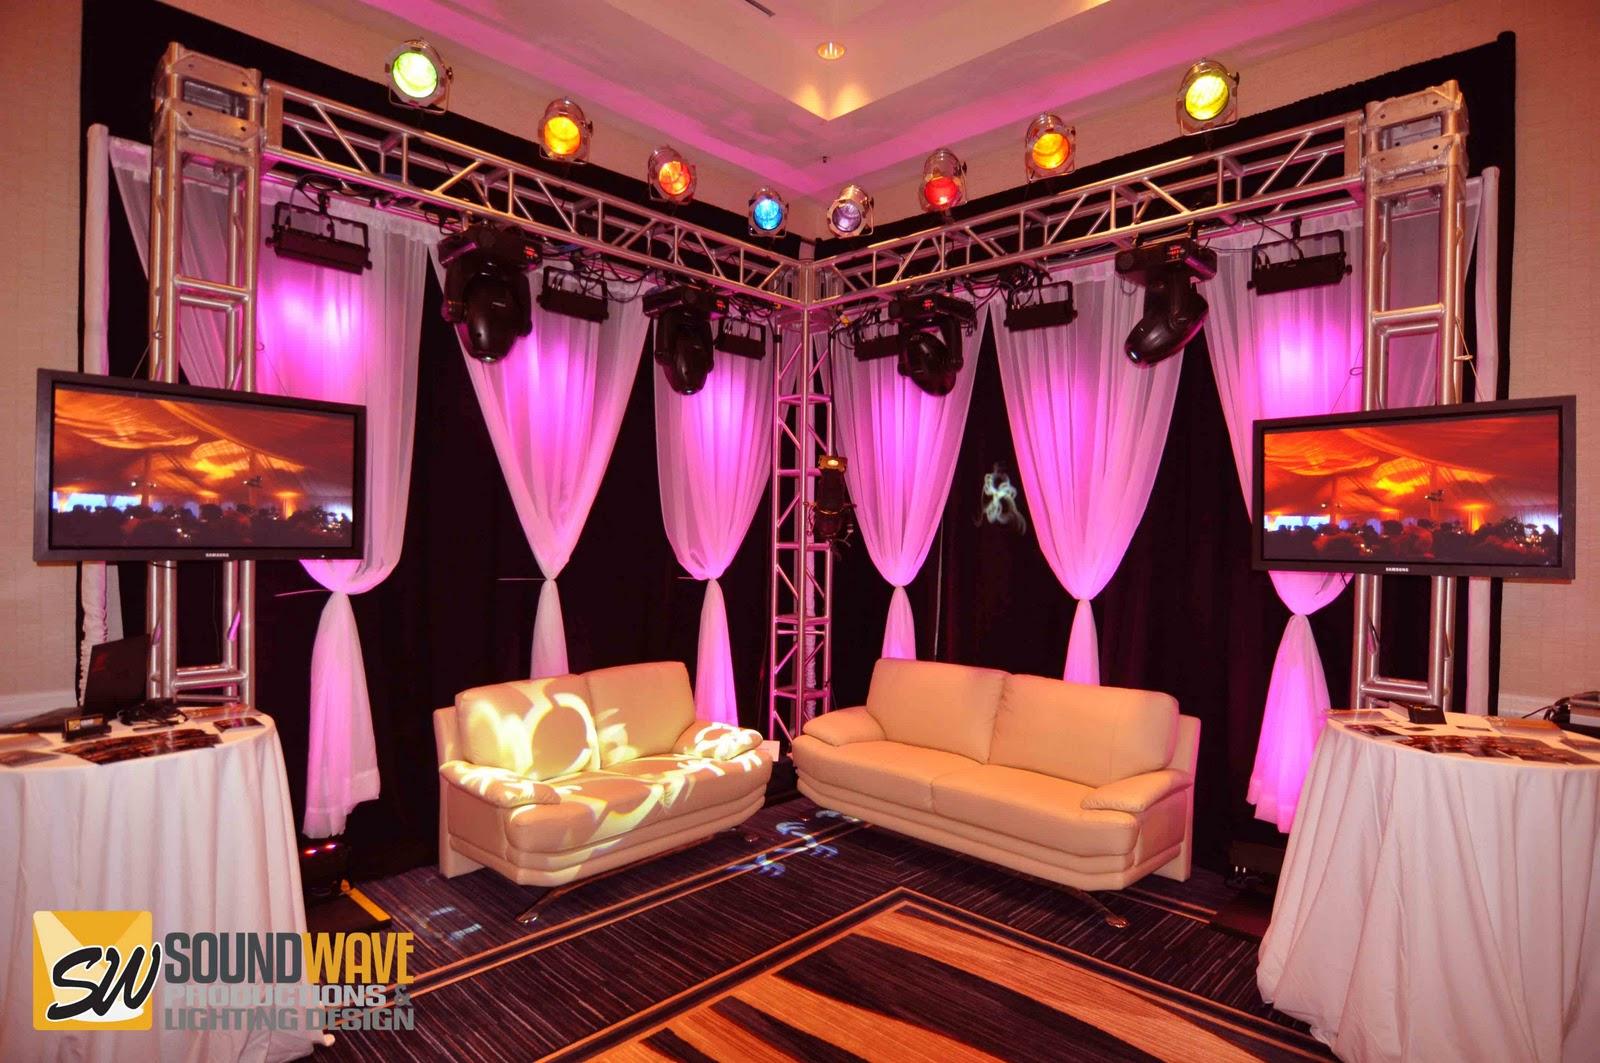 Trade Show Booth Vendors : Wedding marketing tips and ideas for vendors